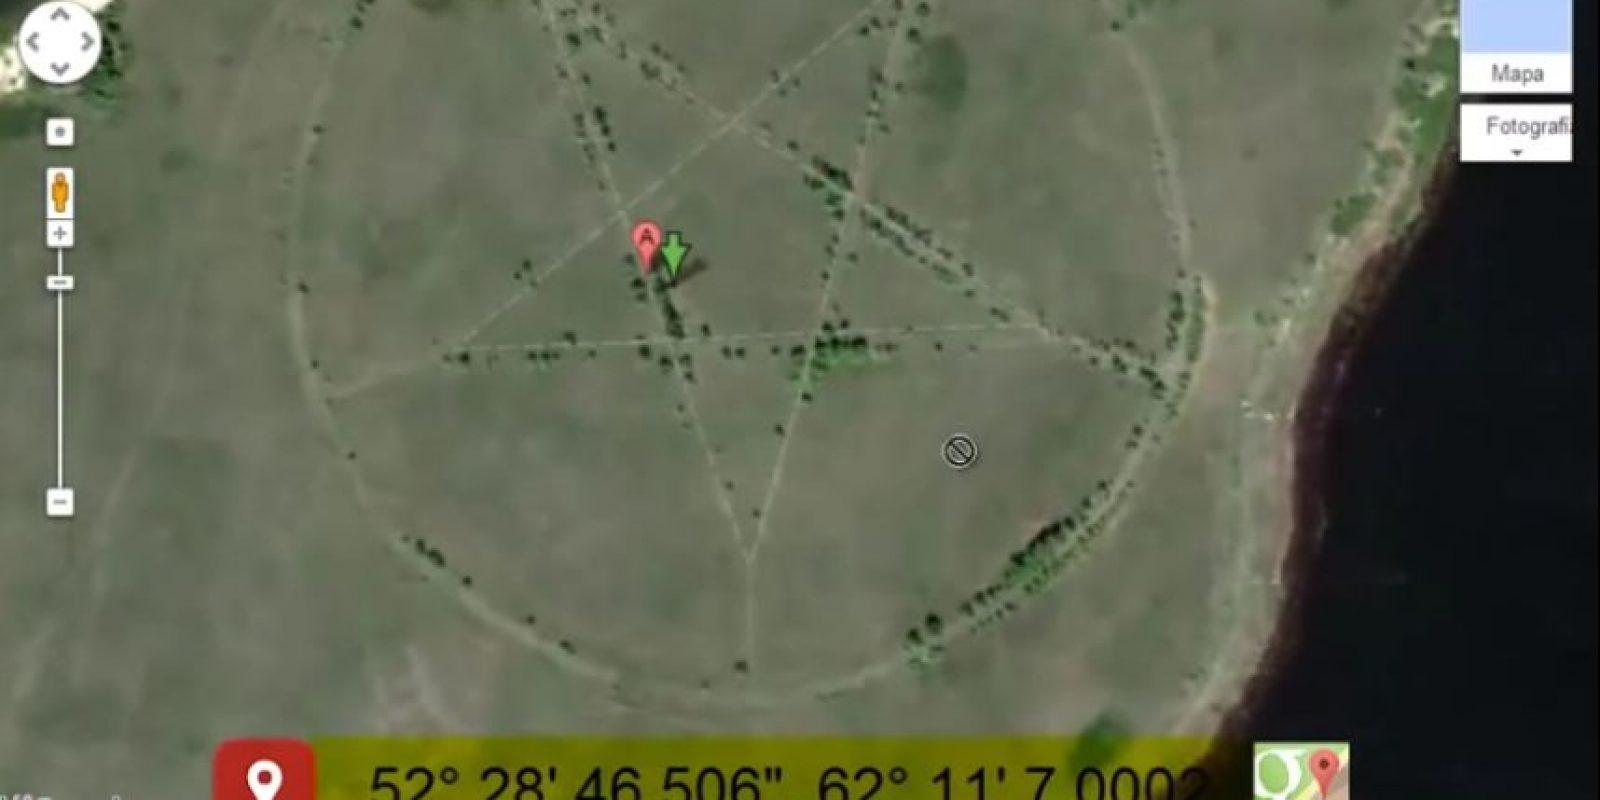 Foto:Google Maps